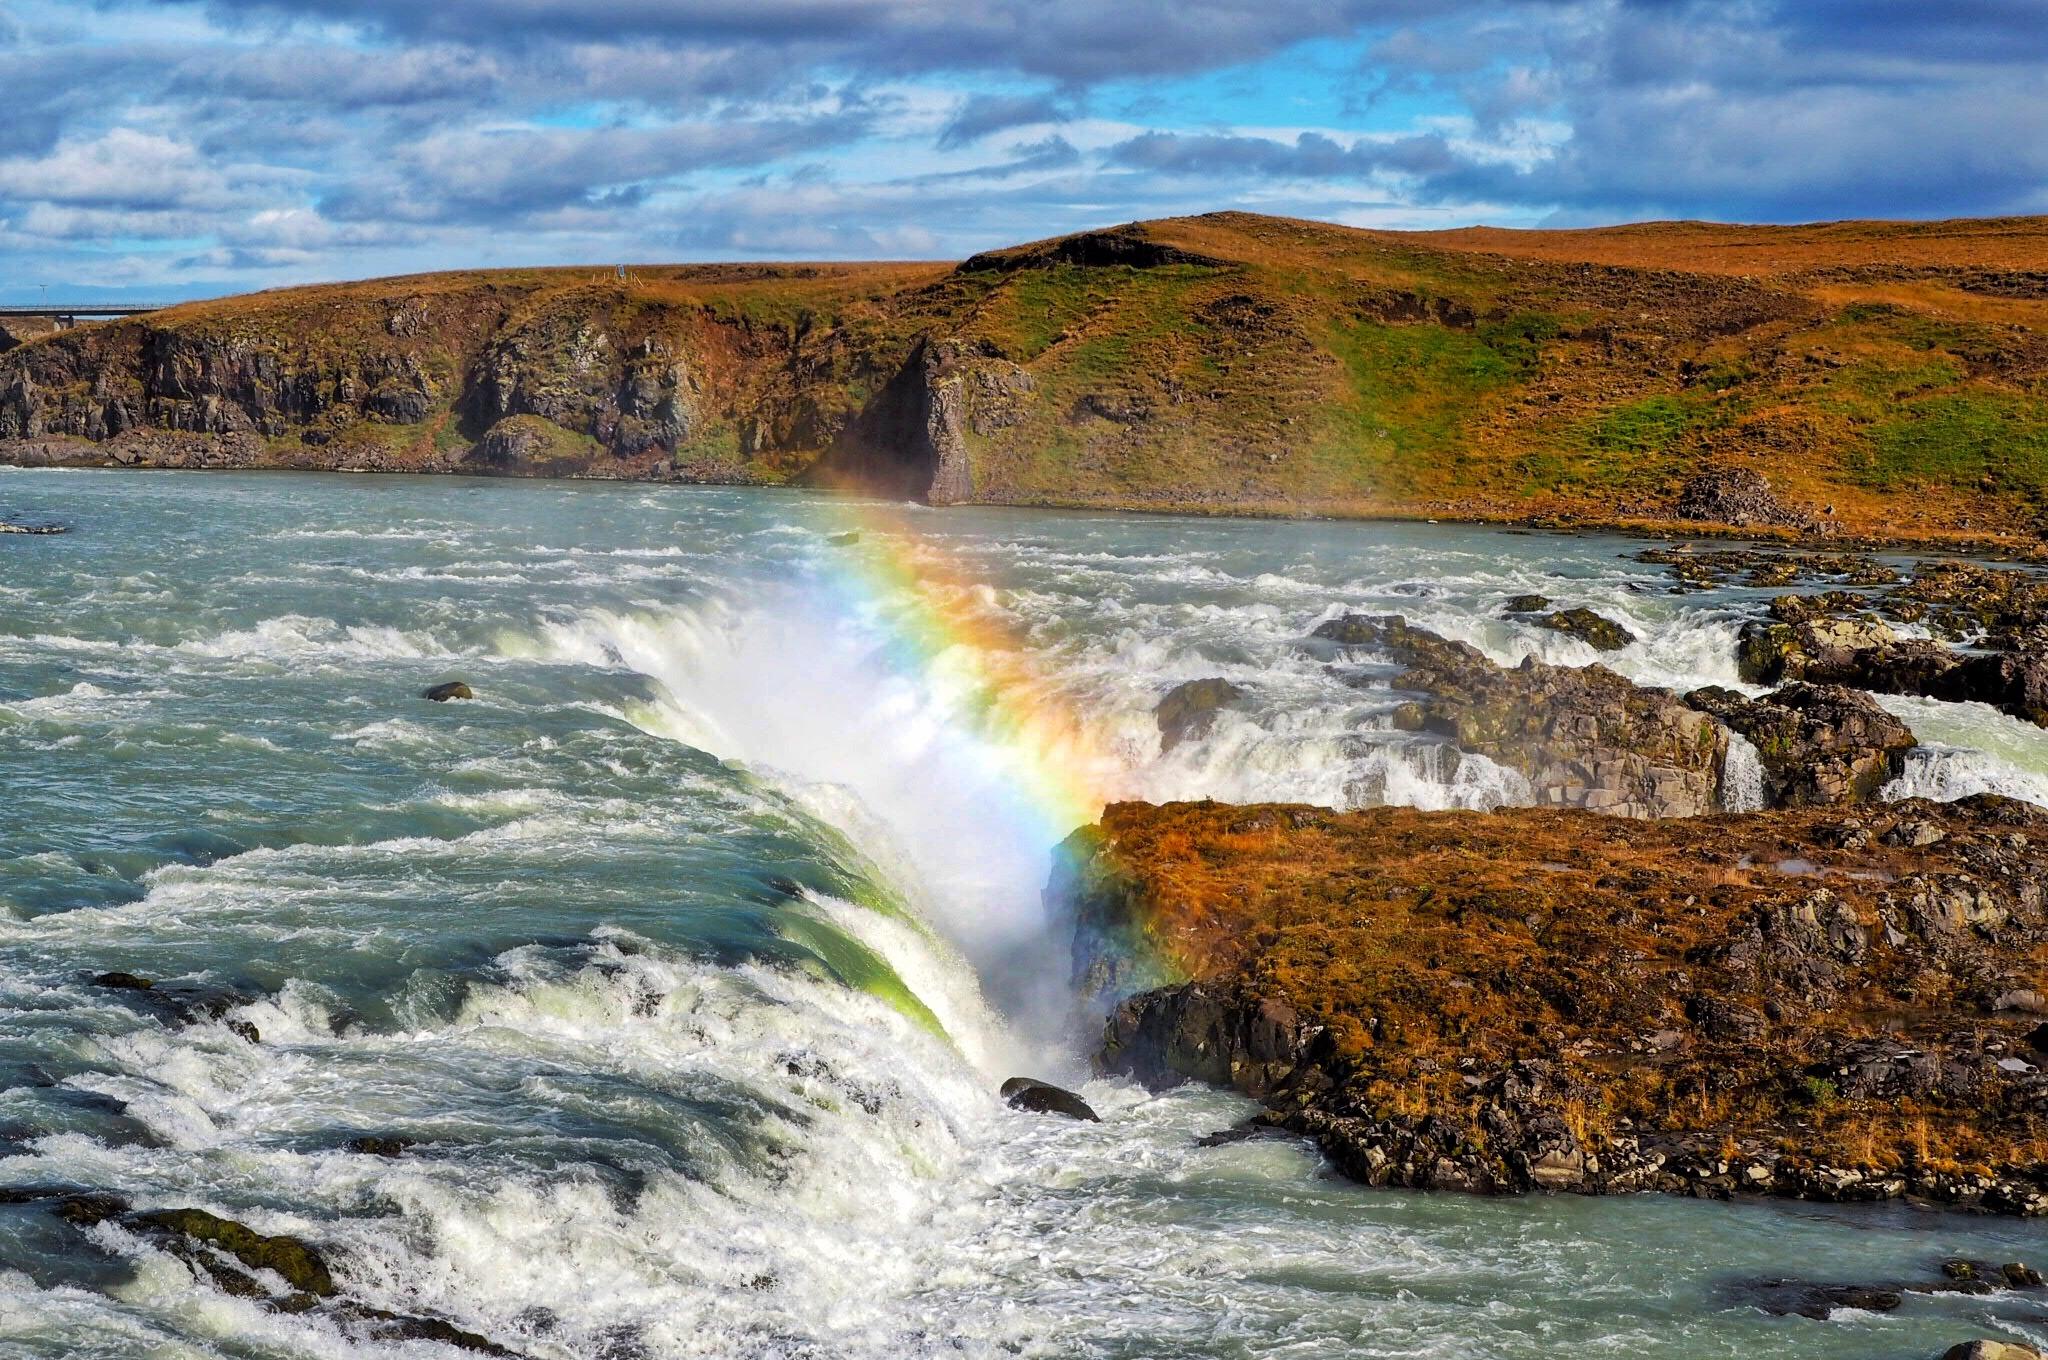 Rainbow-over-Urridafoss-Waterfall-Iceland